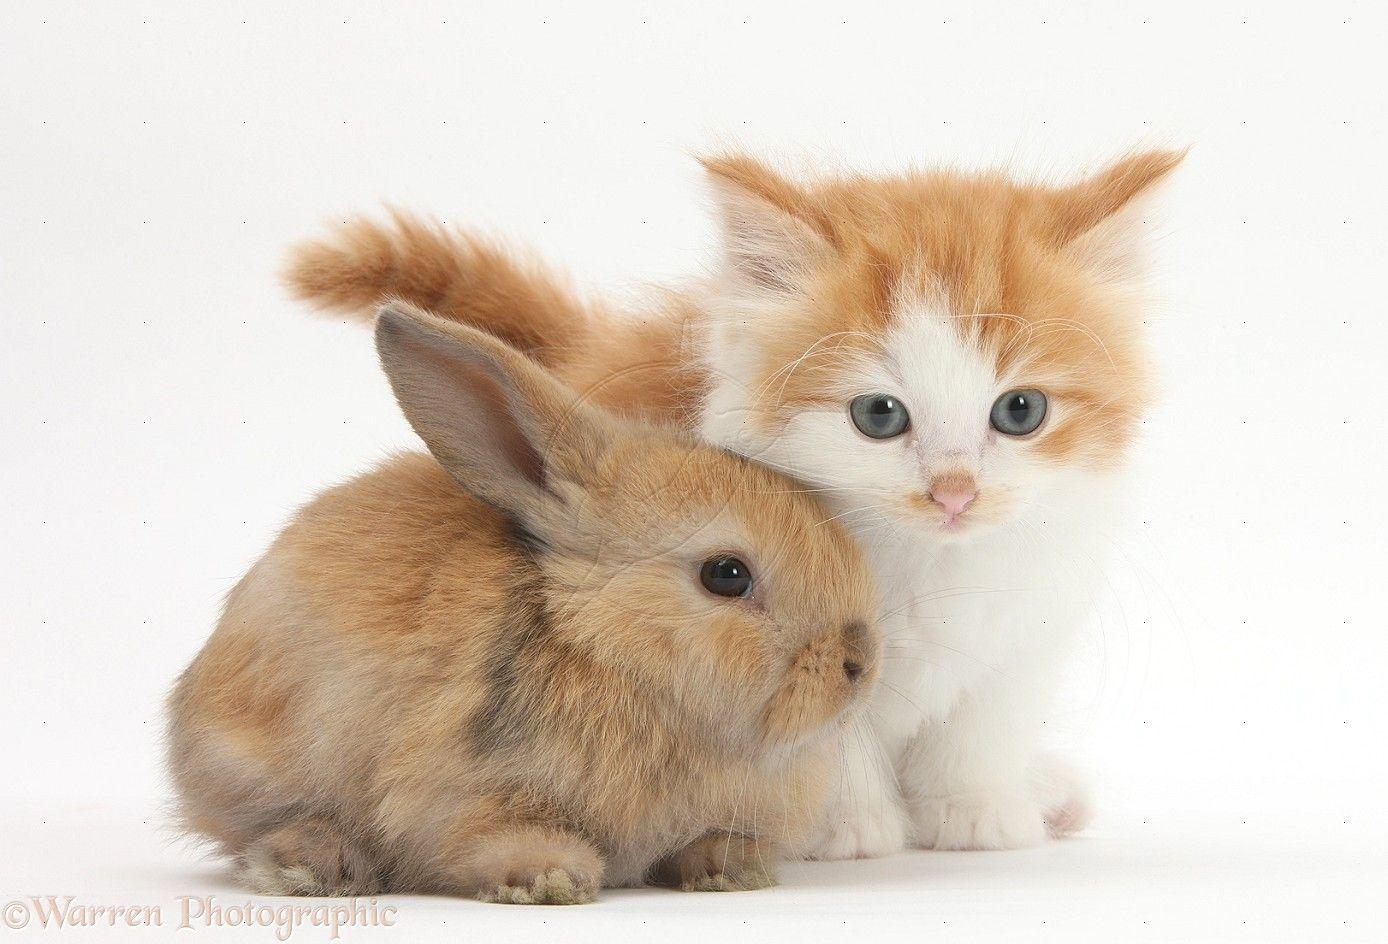 Baby Rabbits Wp30891 Ginger And White Kitten Baby Rabbit Baby Kittens Cute Baby Cats Cute Baby Bunnies